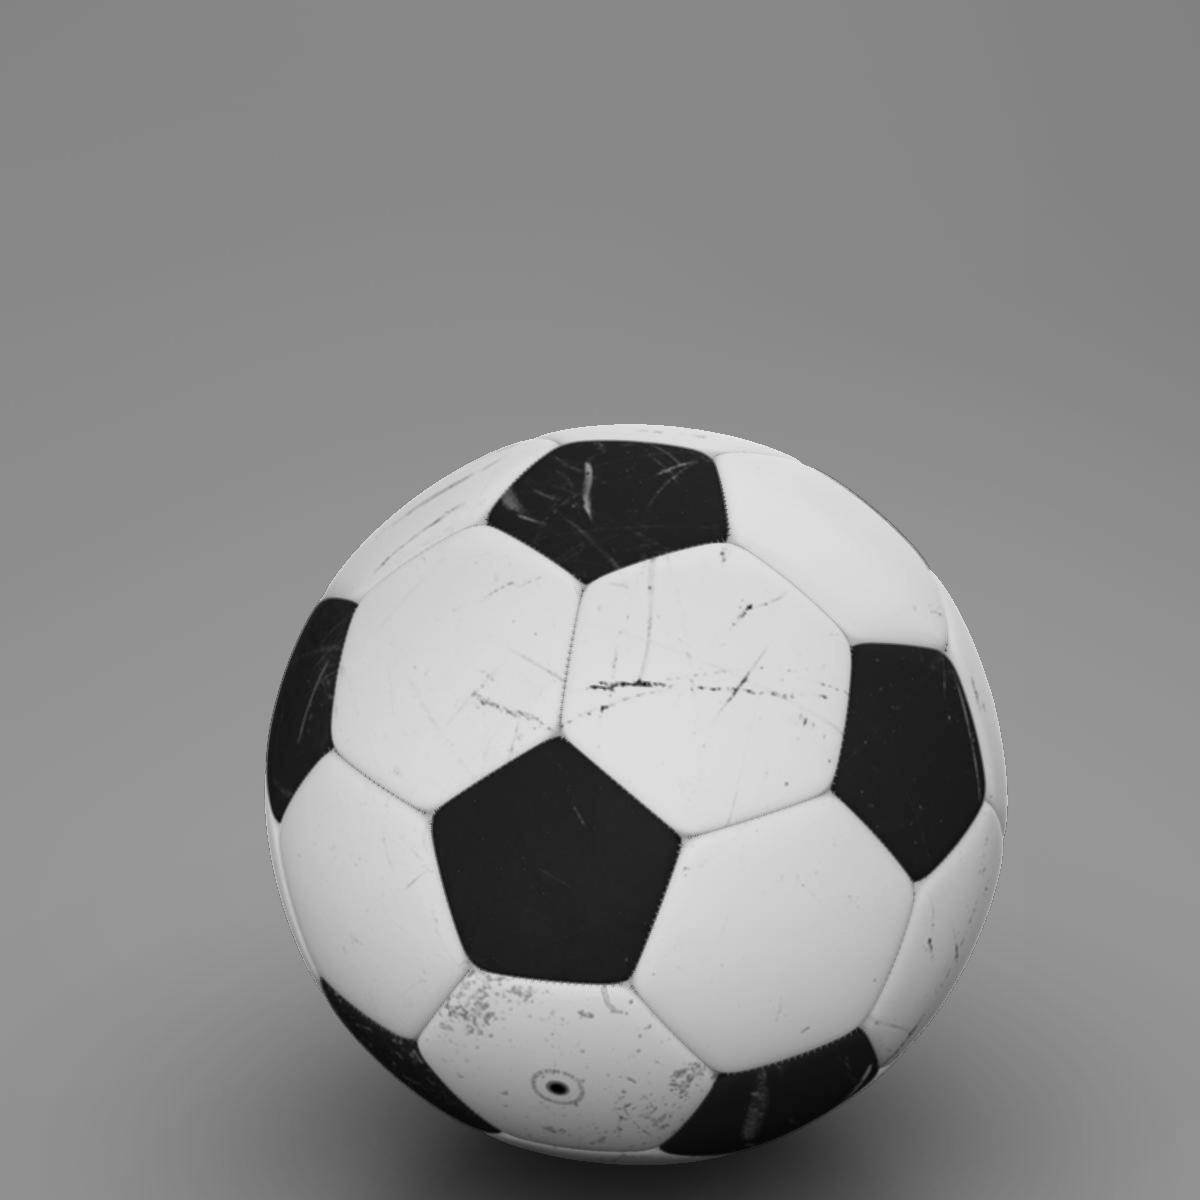 soccerball black white 3d model 3ds max fbx c4d ma mb obj 203955